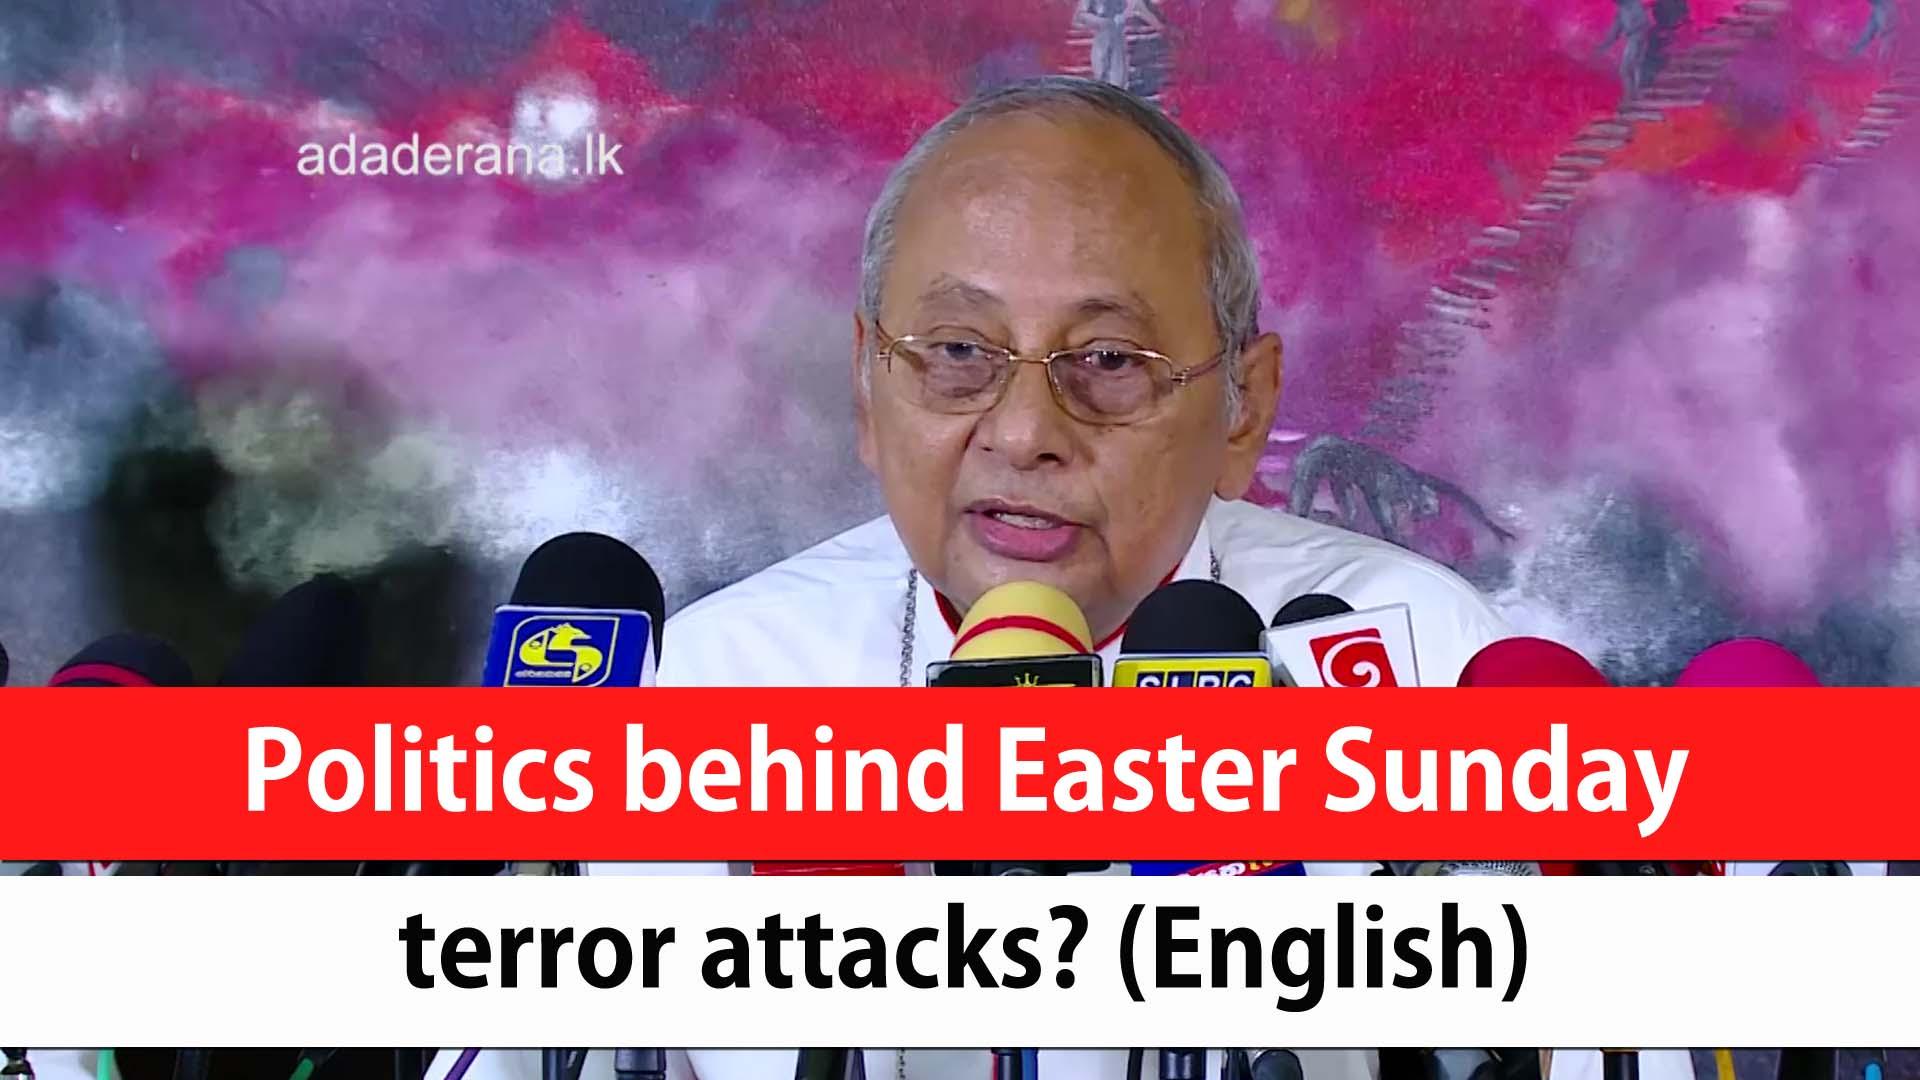 Politics behind Easter Sunday terror attacks? (English)